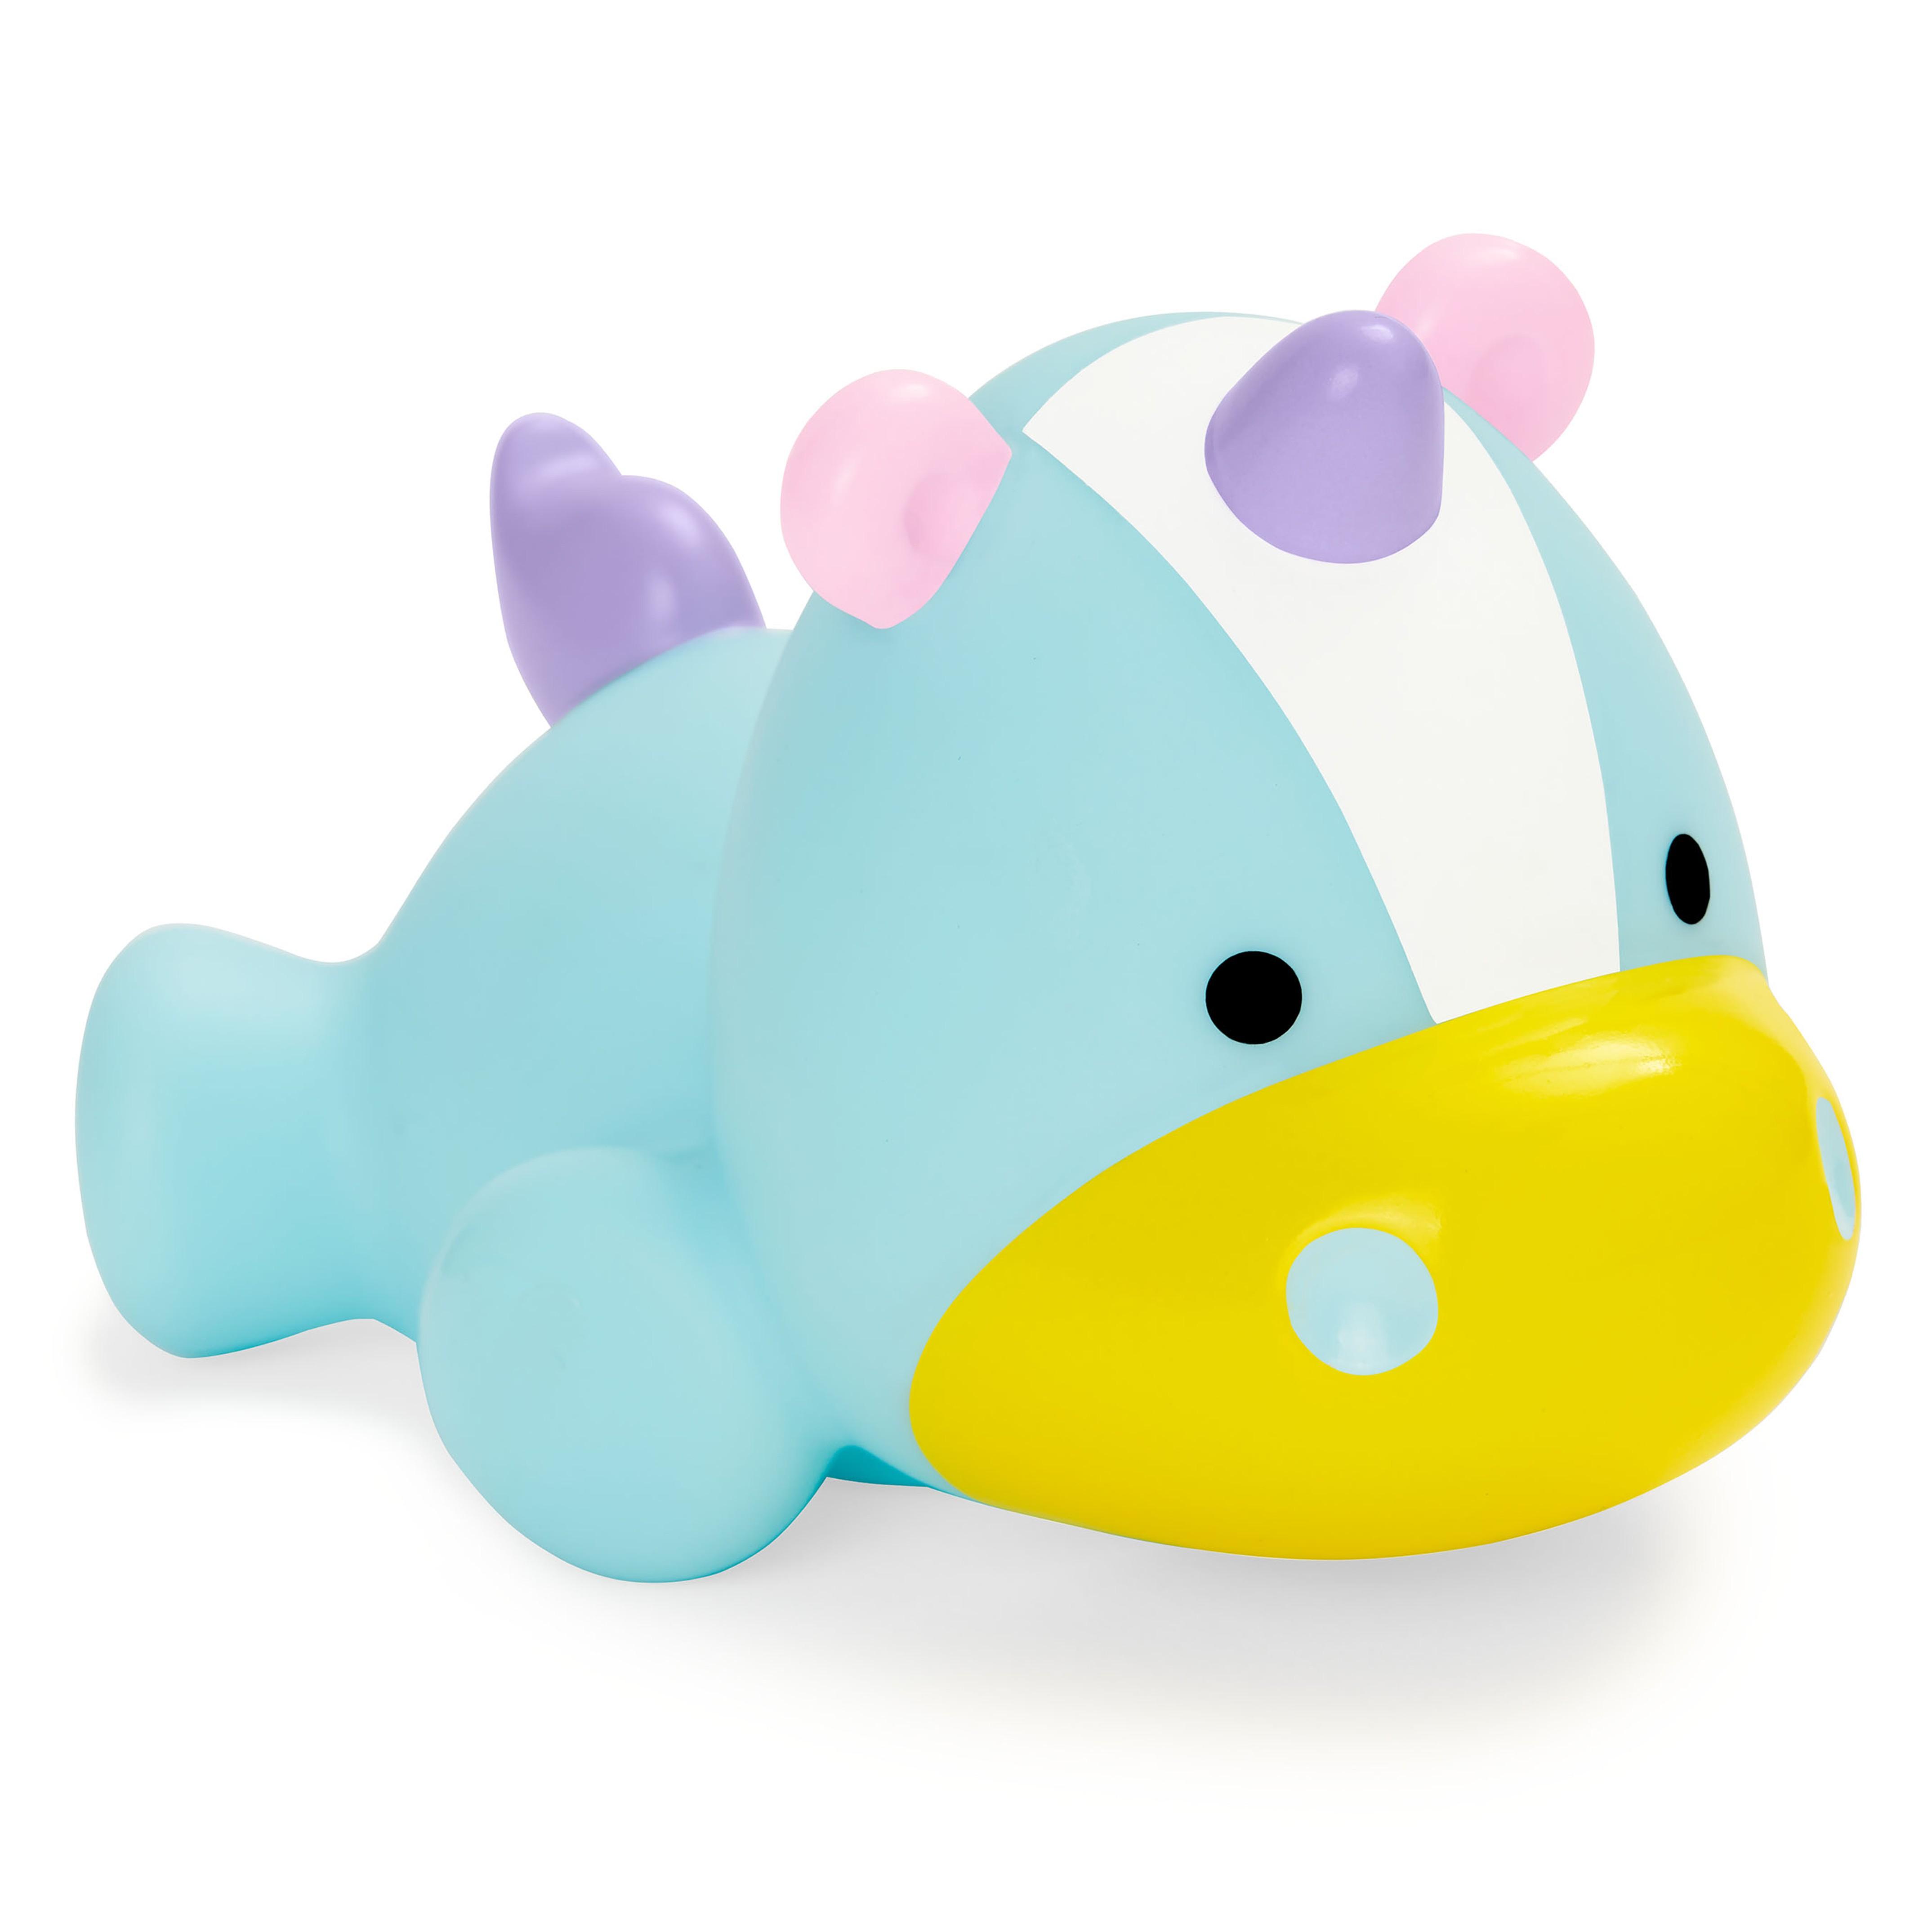 Zoo hračka do vody Light up Jednorožec 9m+